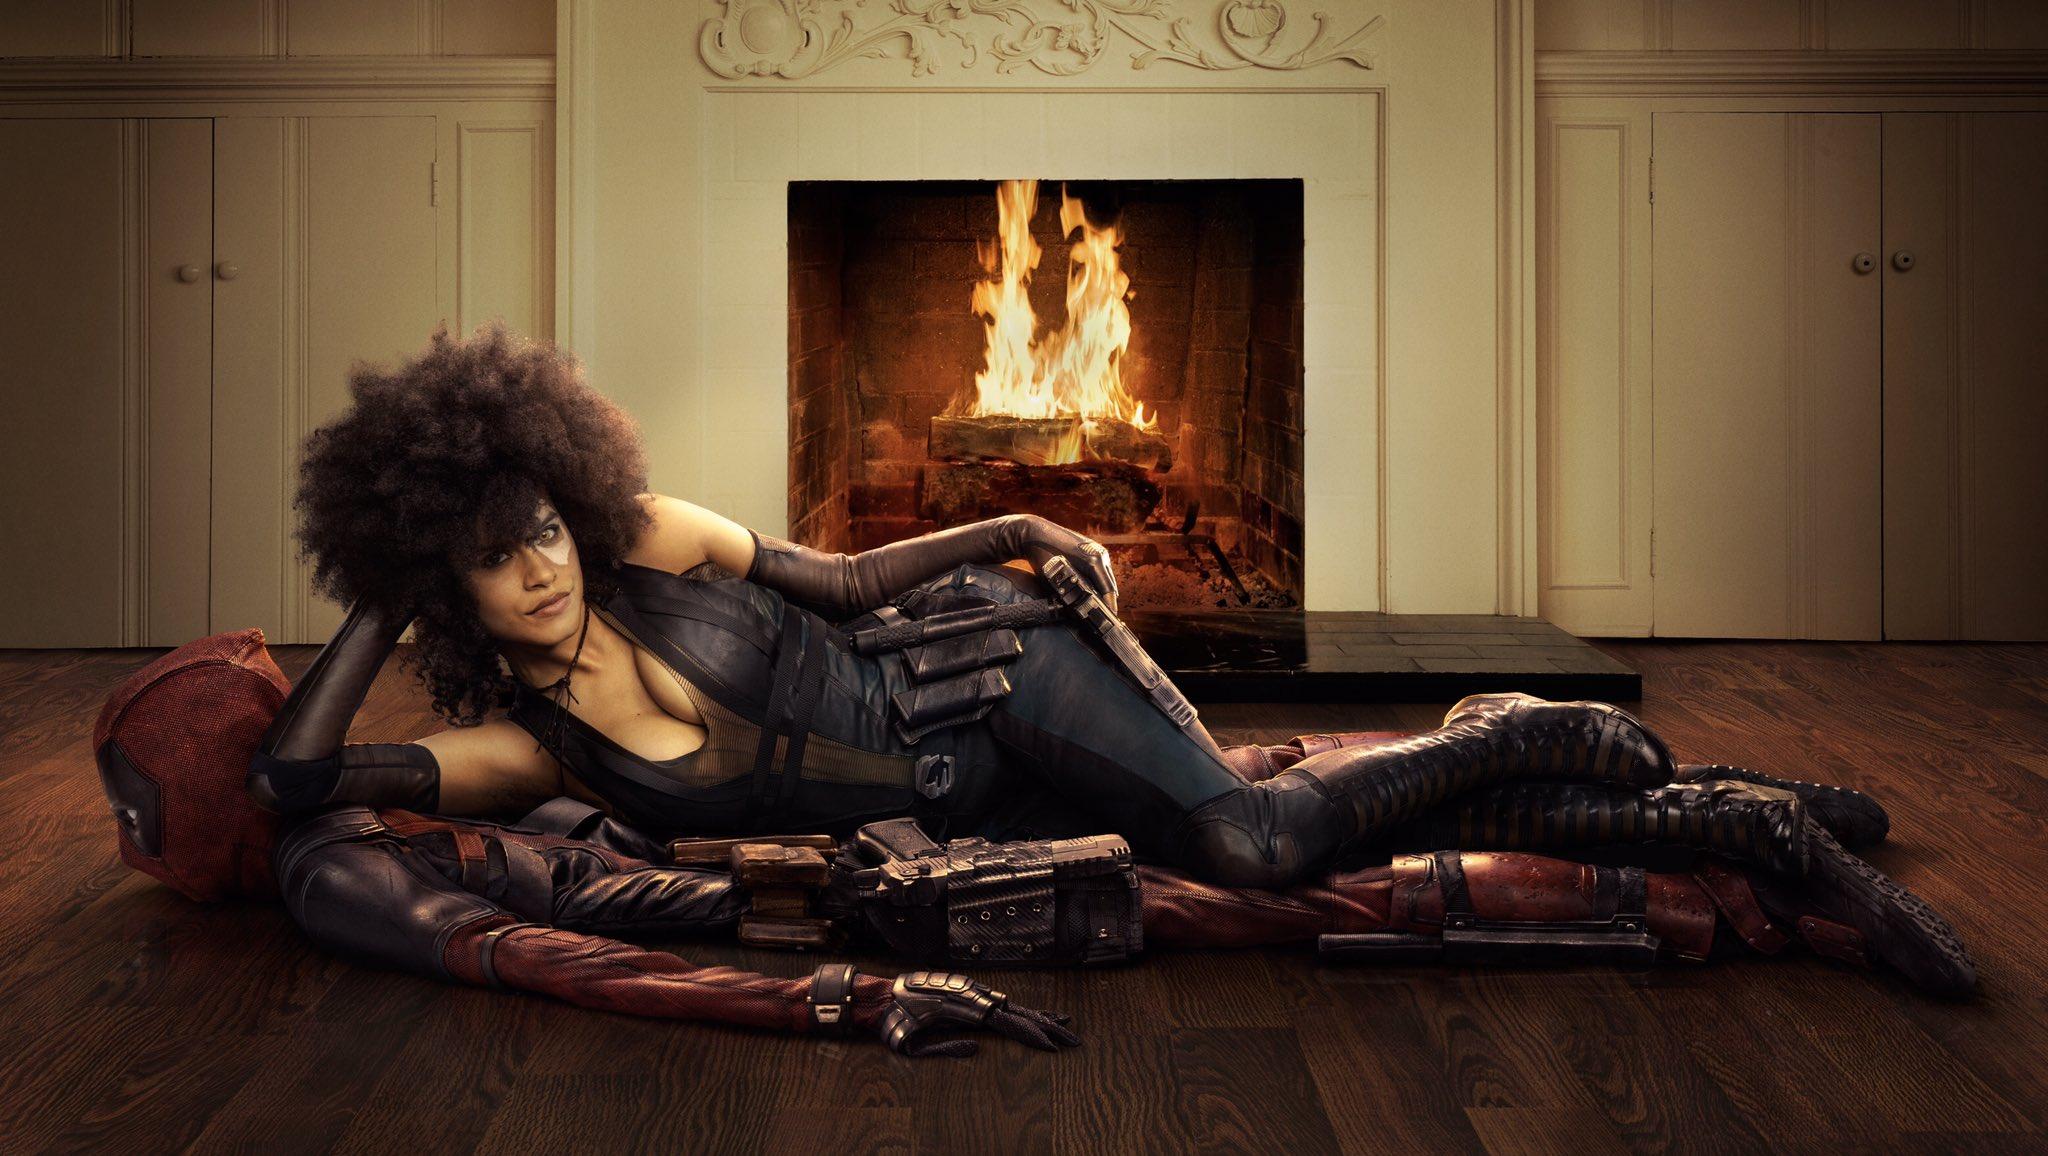 Zazie Beetz kot Domino in Ryan Reynolds kot Deadpool v filmu Deadpool 2